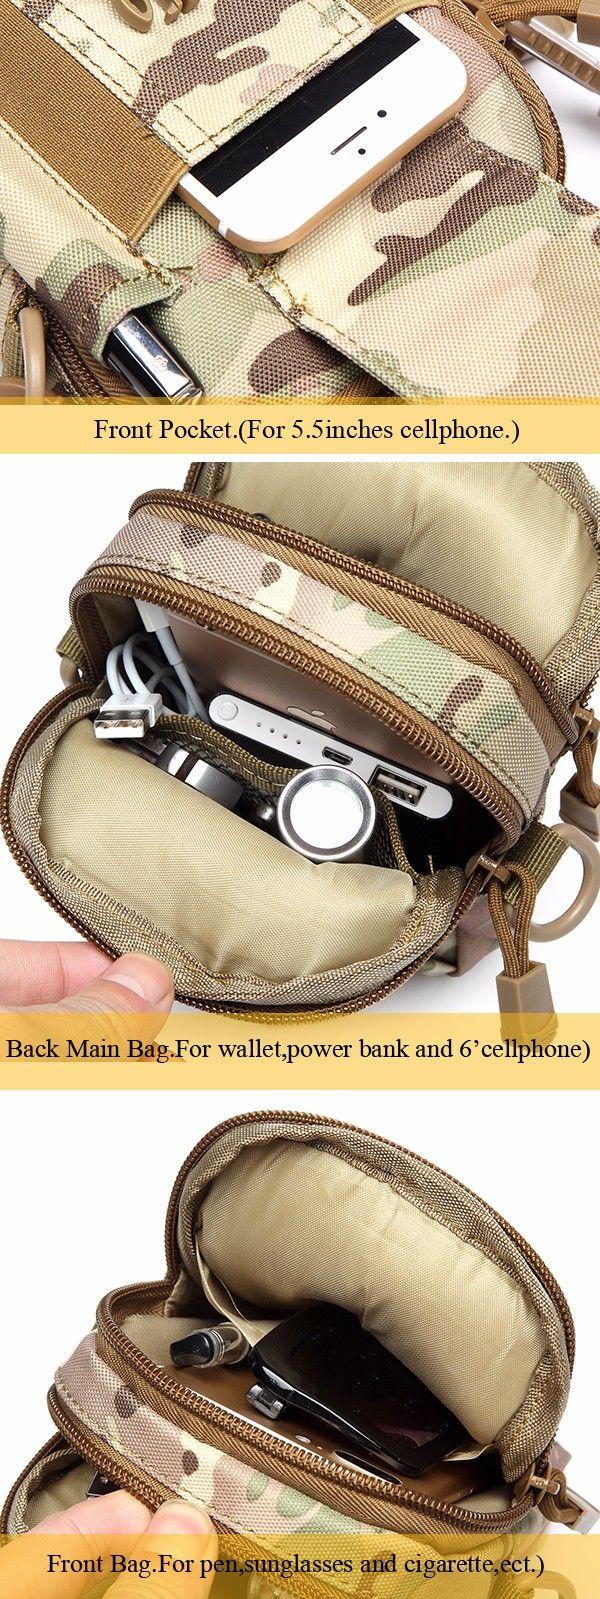 6inches Cellphone Men Nylon Crossbody Bag Tool Tactical Waist Bag